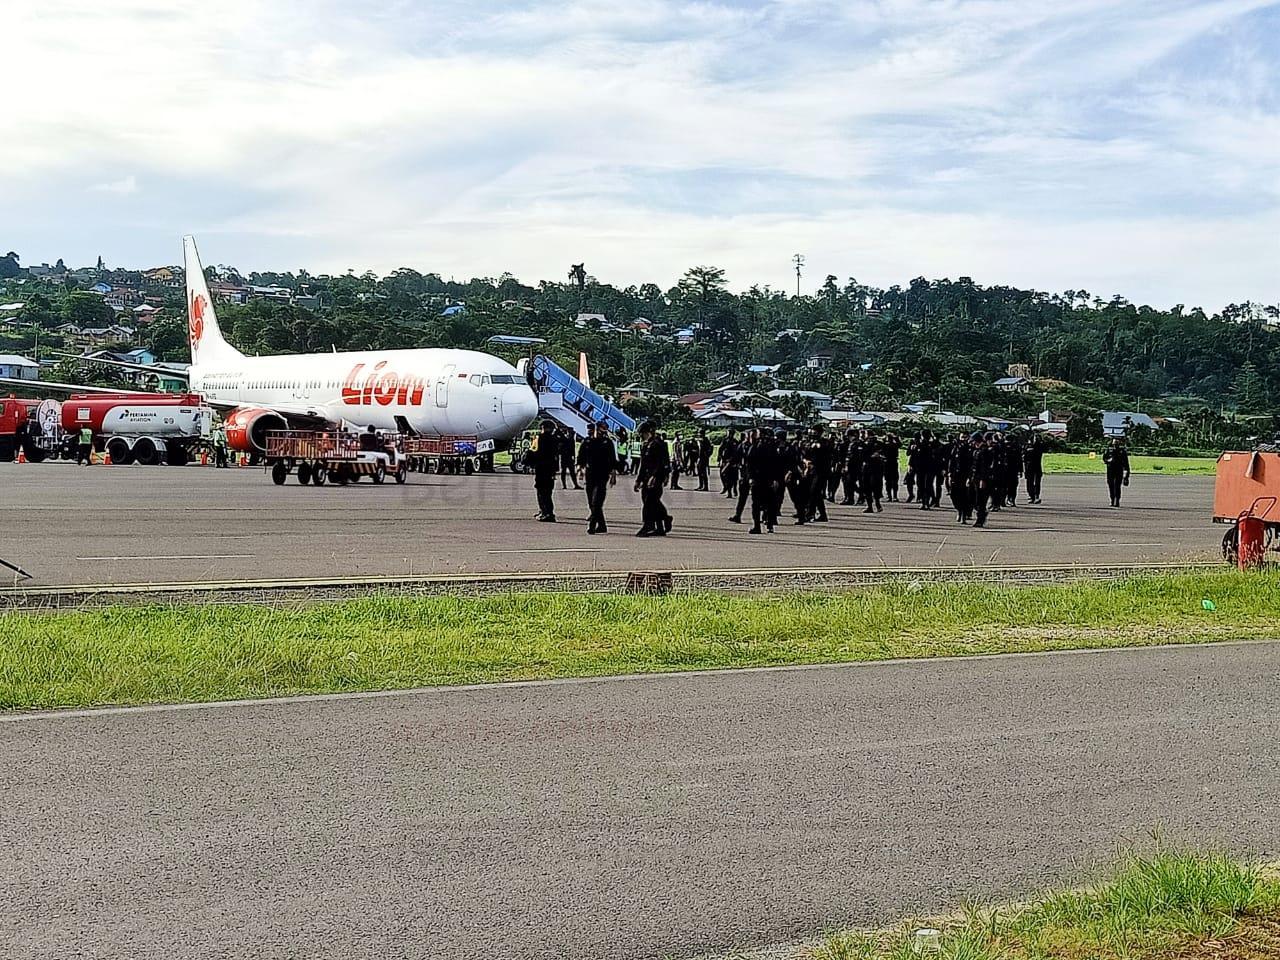 200 Personel Brimob Dari Kelapa Dua Jakarta Tiba di Papua Barat 15 IMG 20201206 WA0026